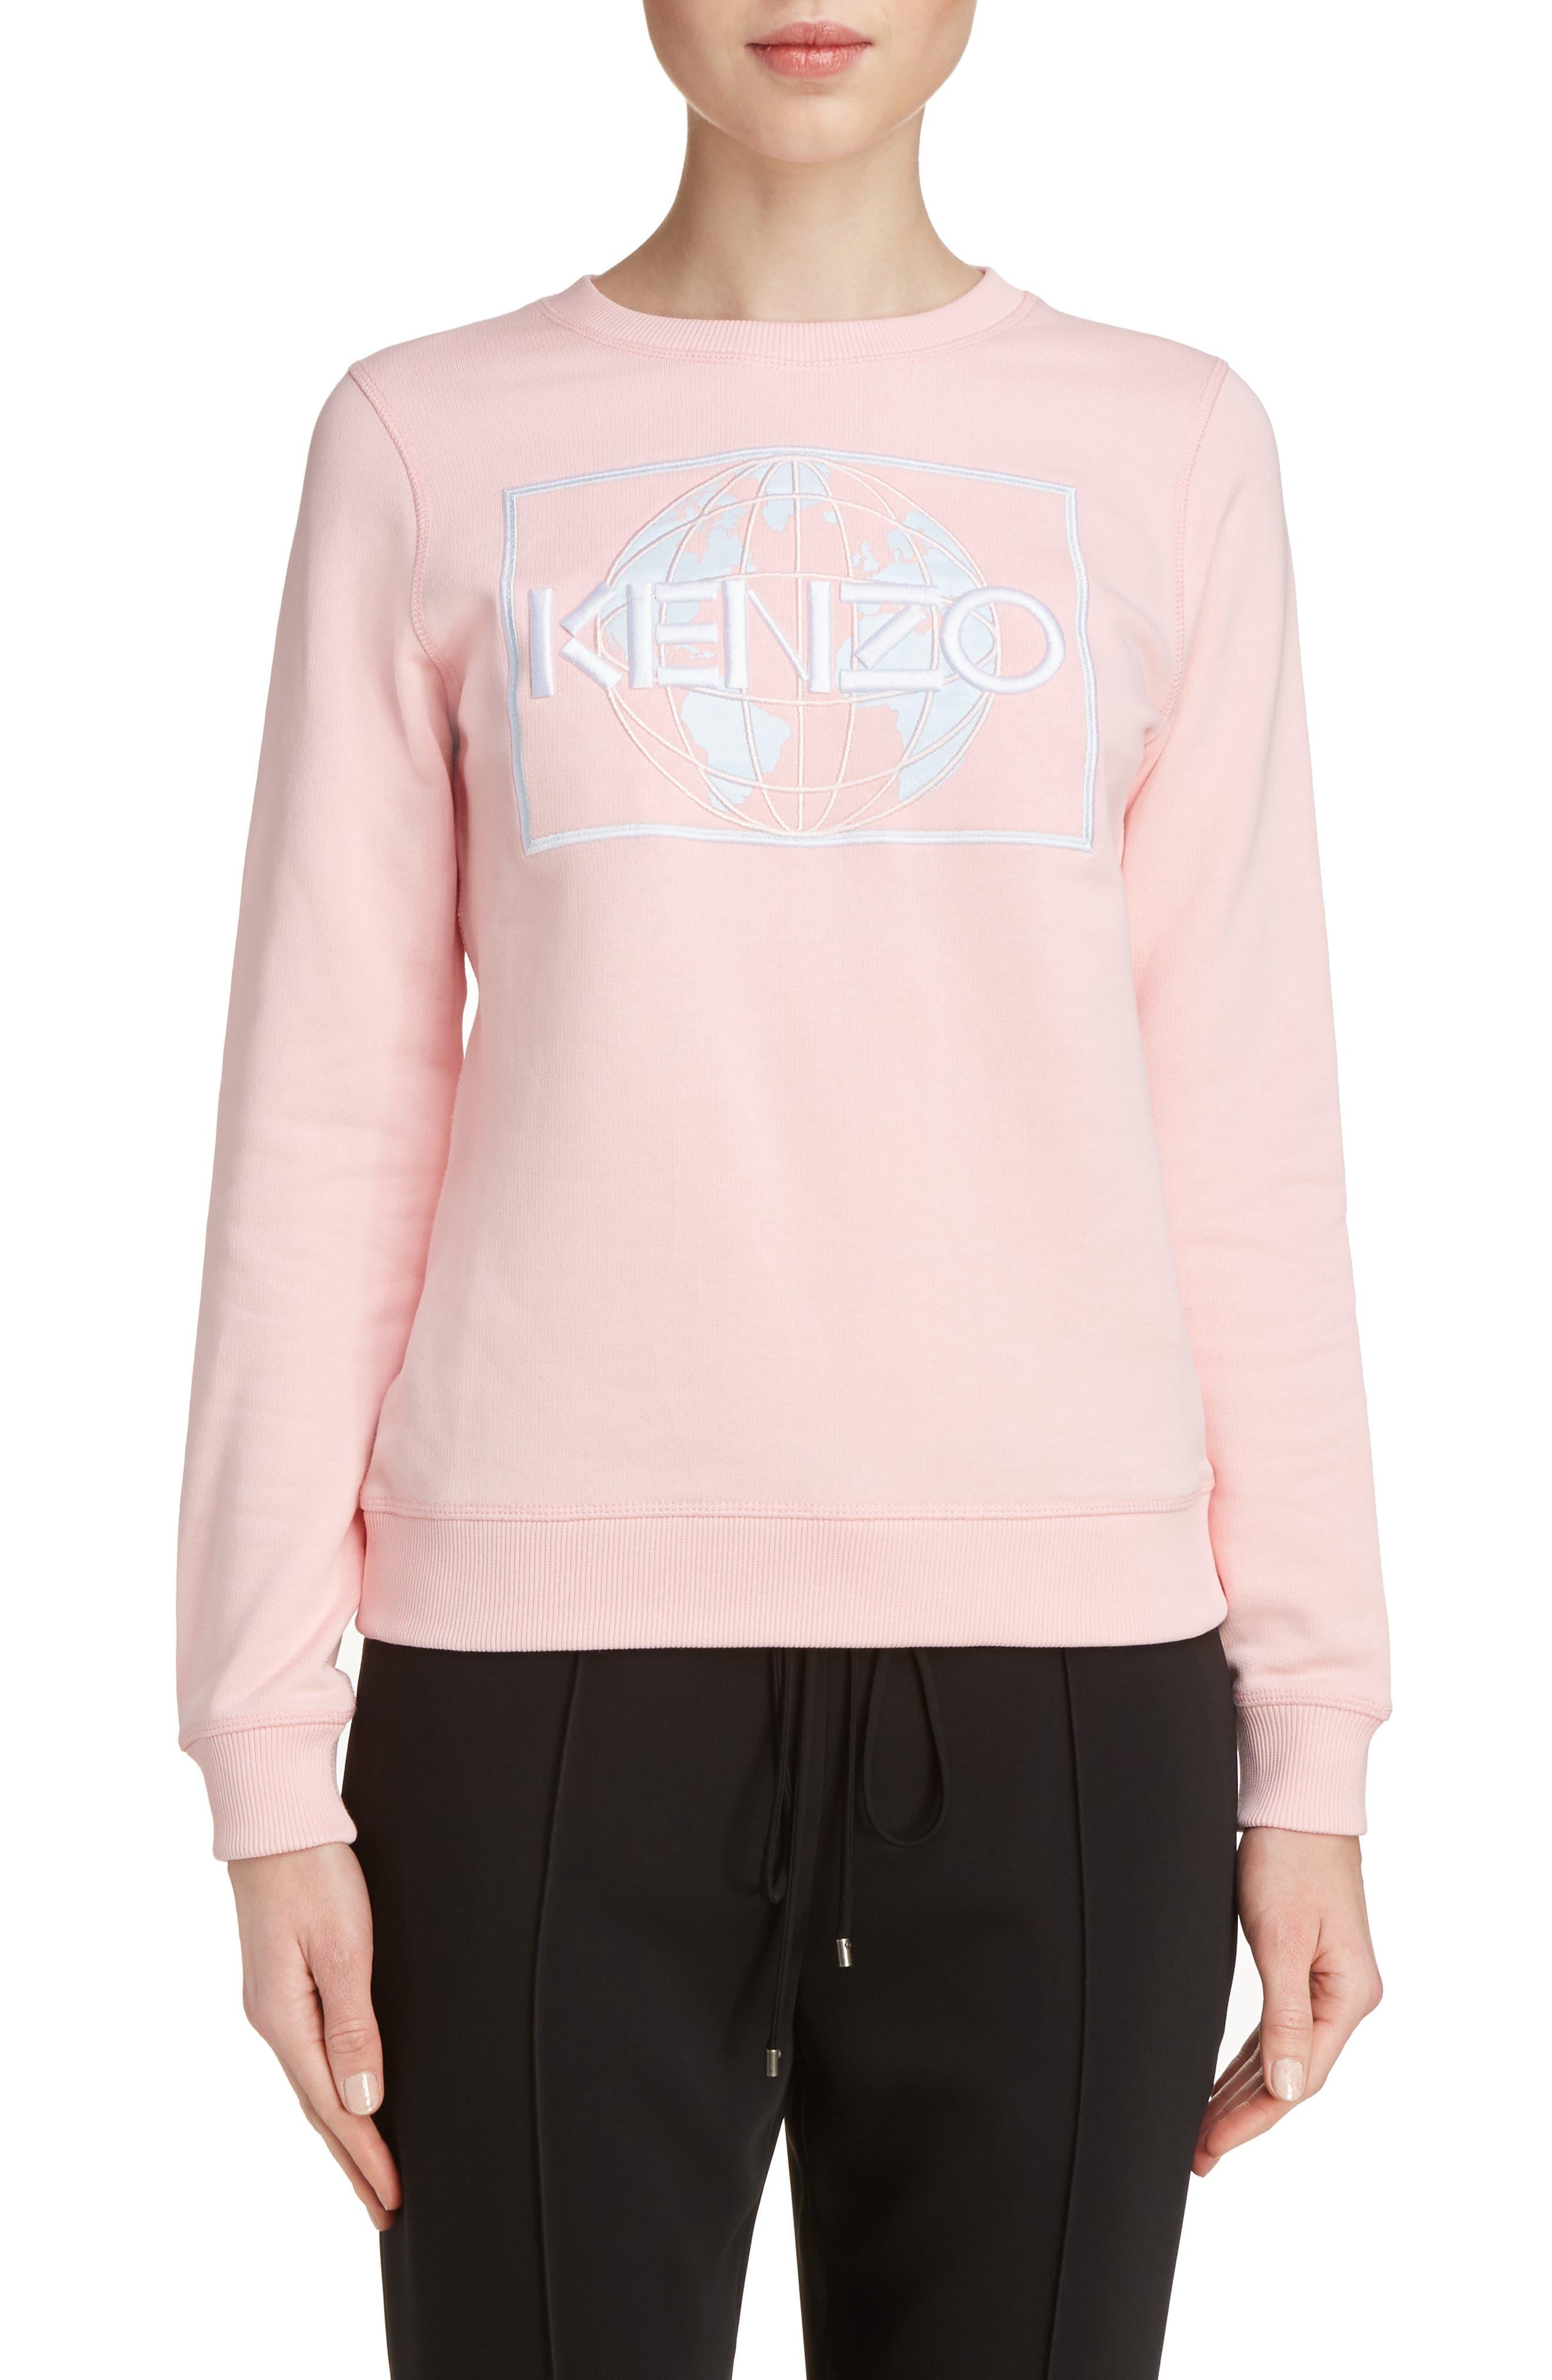 Alternate Image 1 Selected - KENZO Embroidered Cotton Sweatshirt